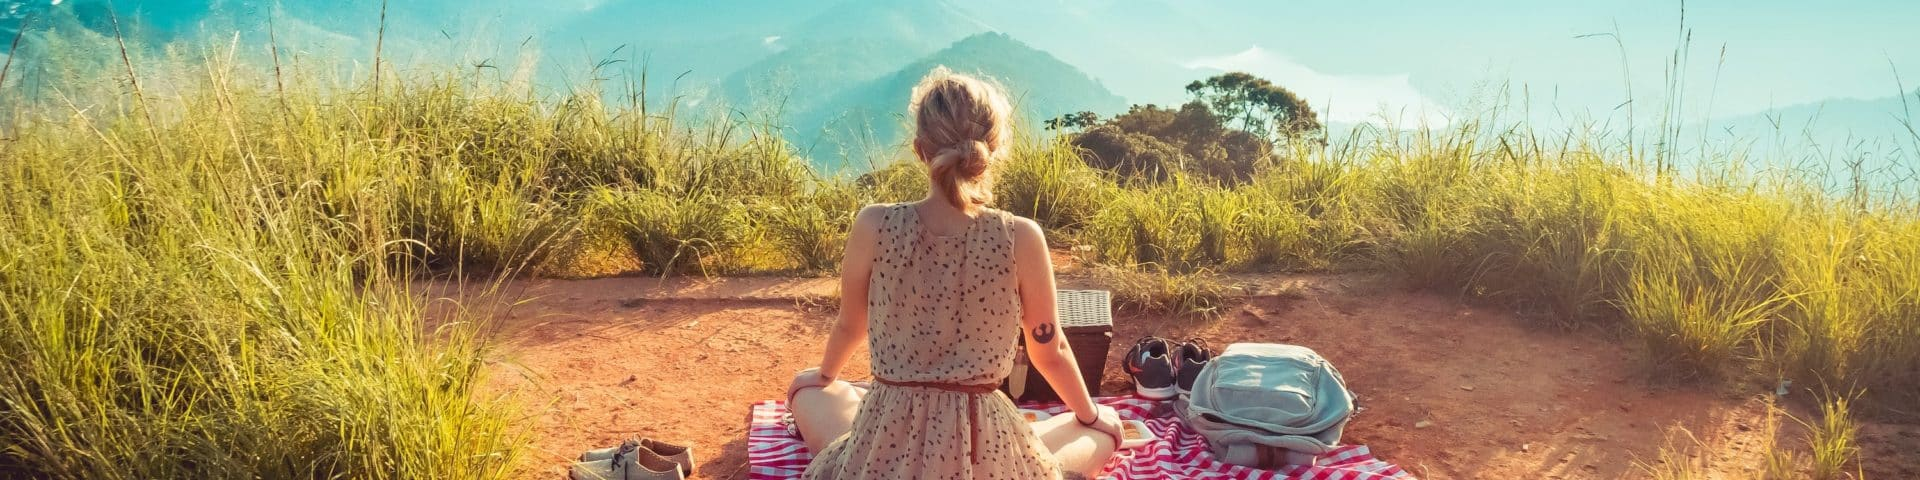 Reflexion bringt Entspannung